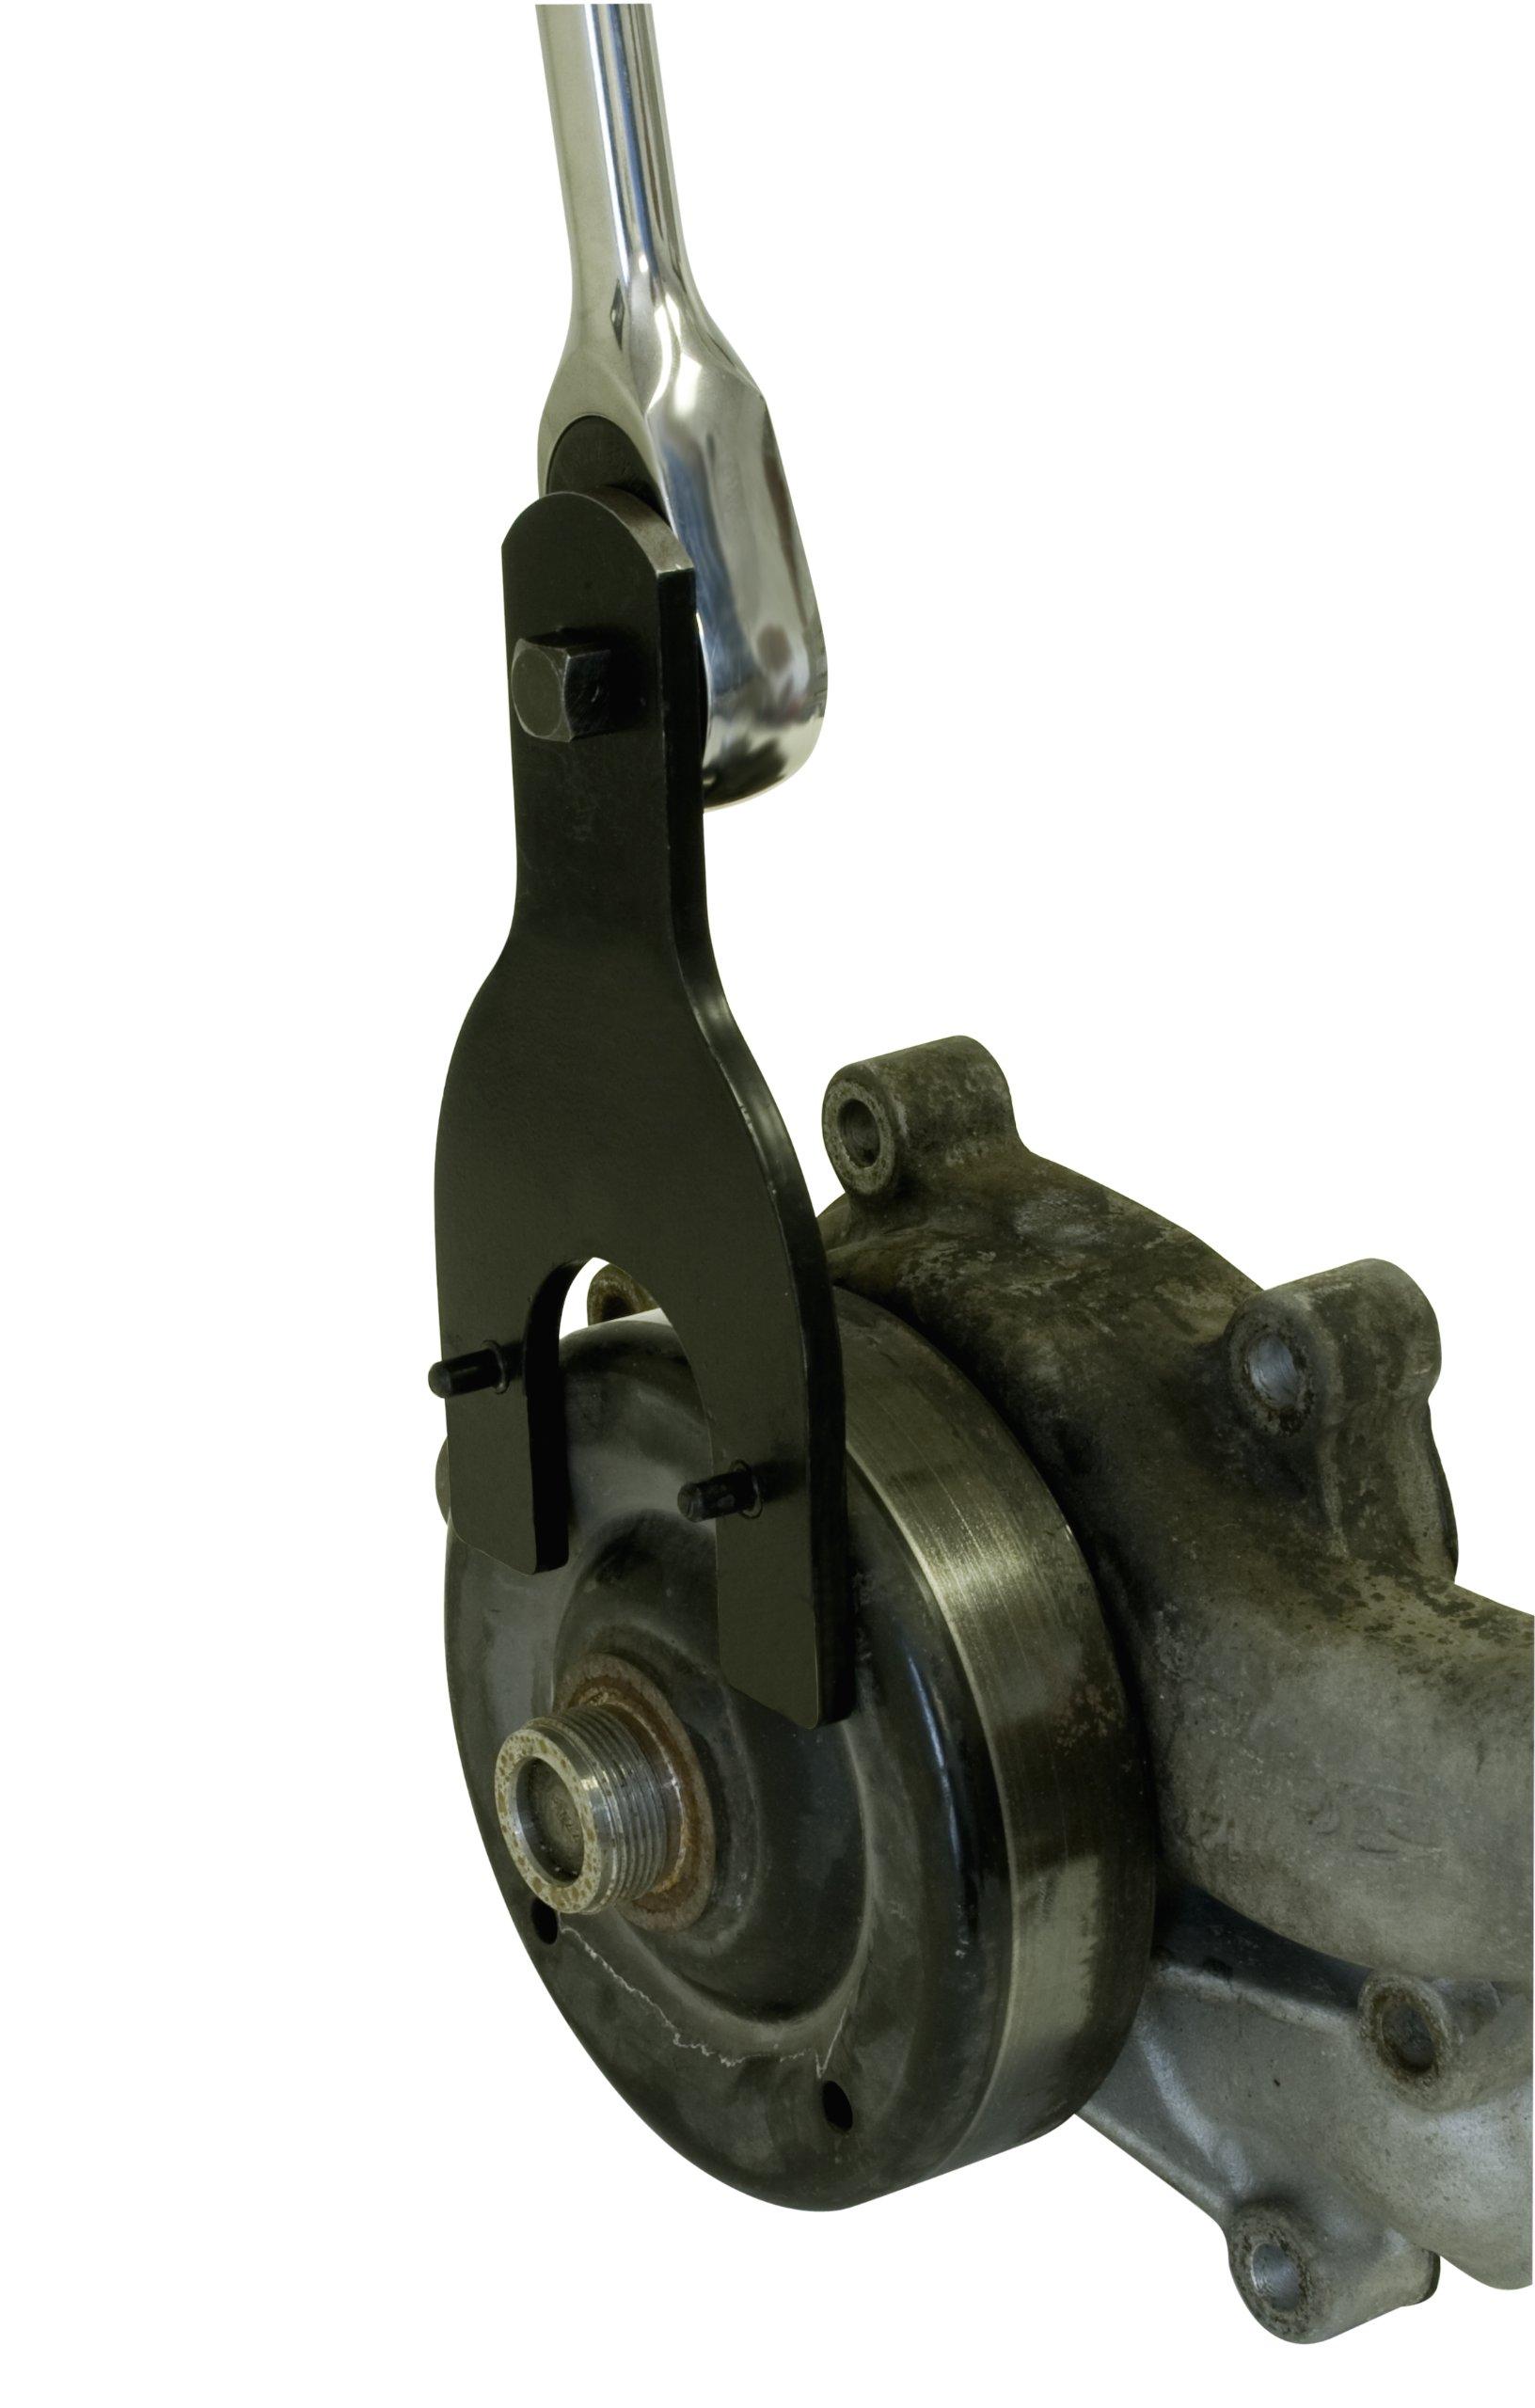 Lisle 43600 Universal Fan Clutch Wrench Set by Lisle (Image #1)